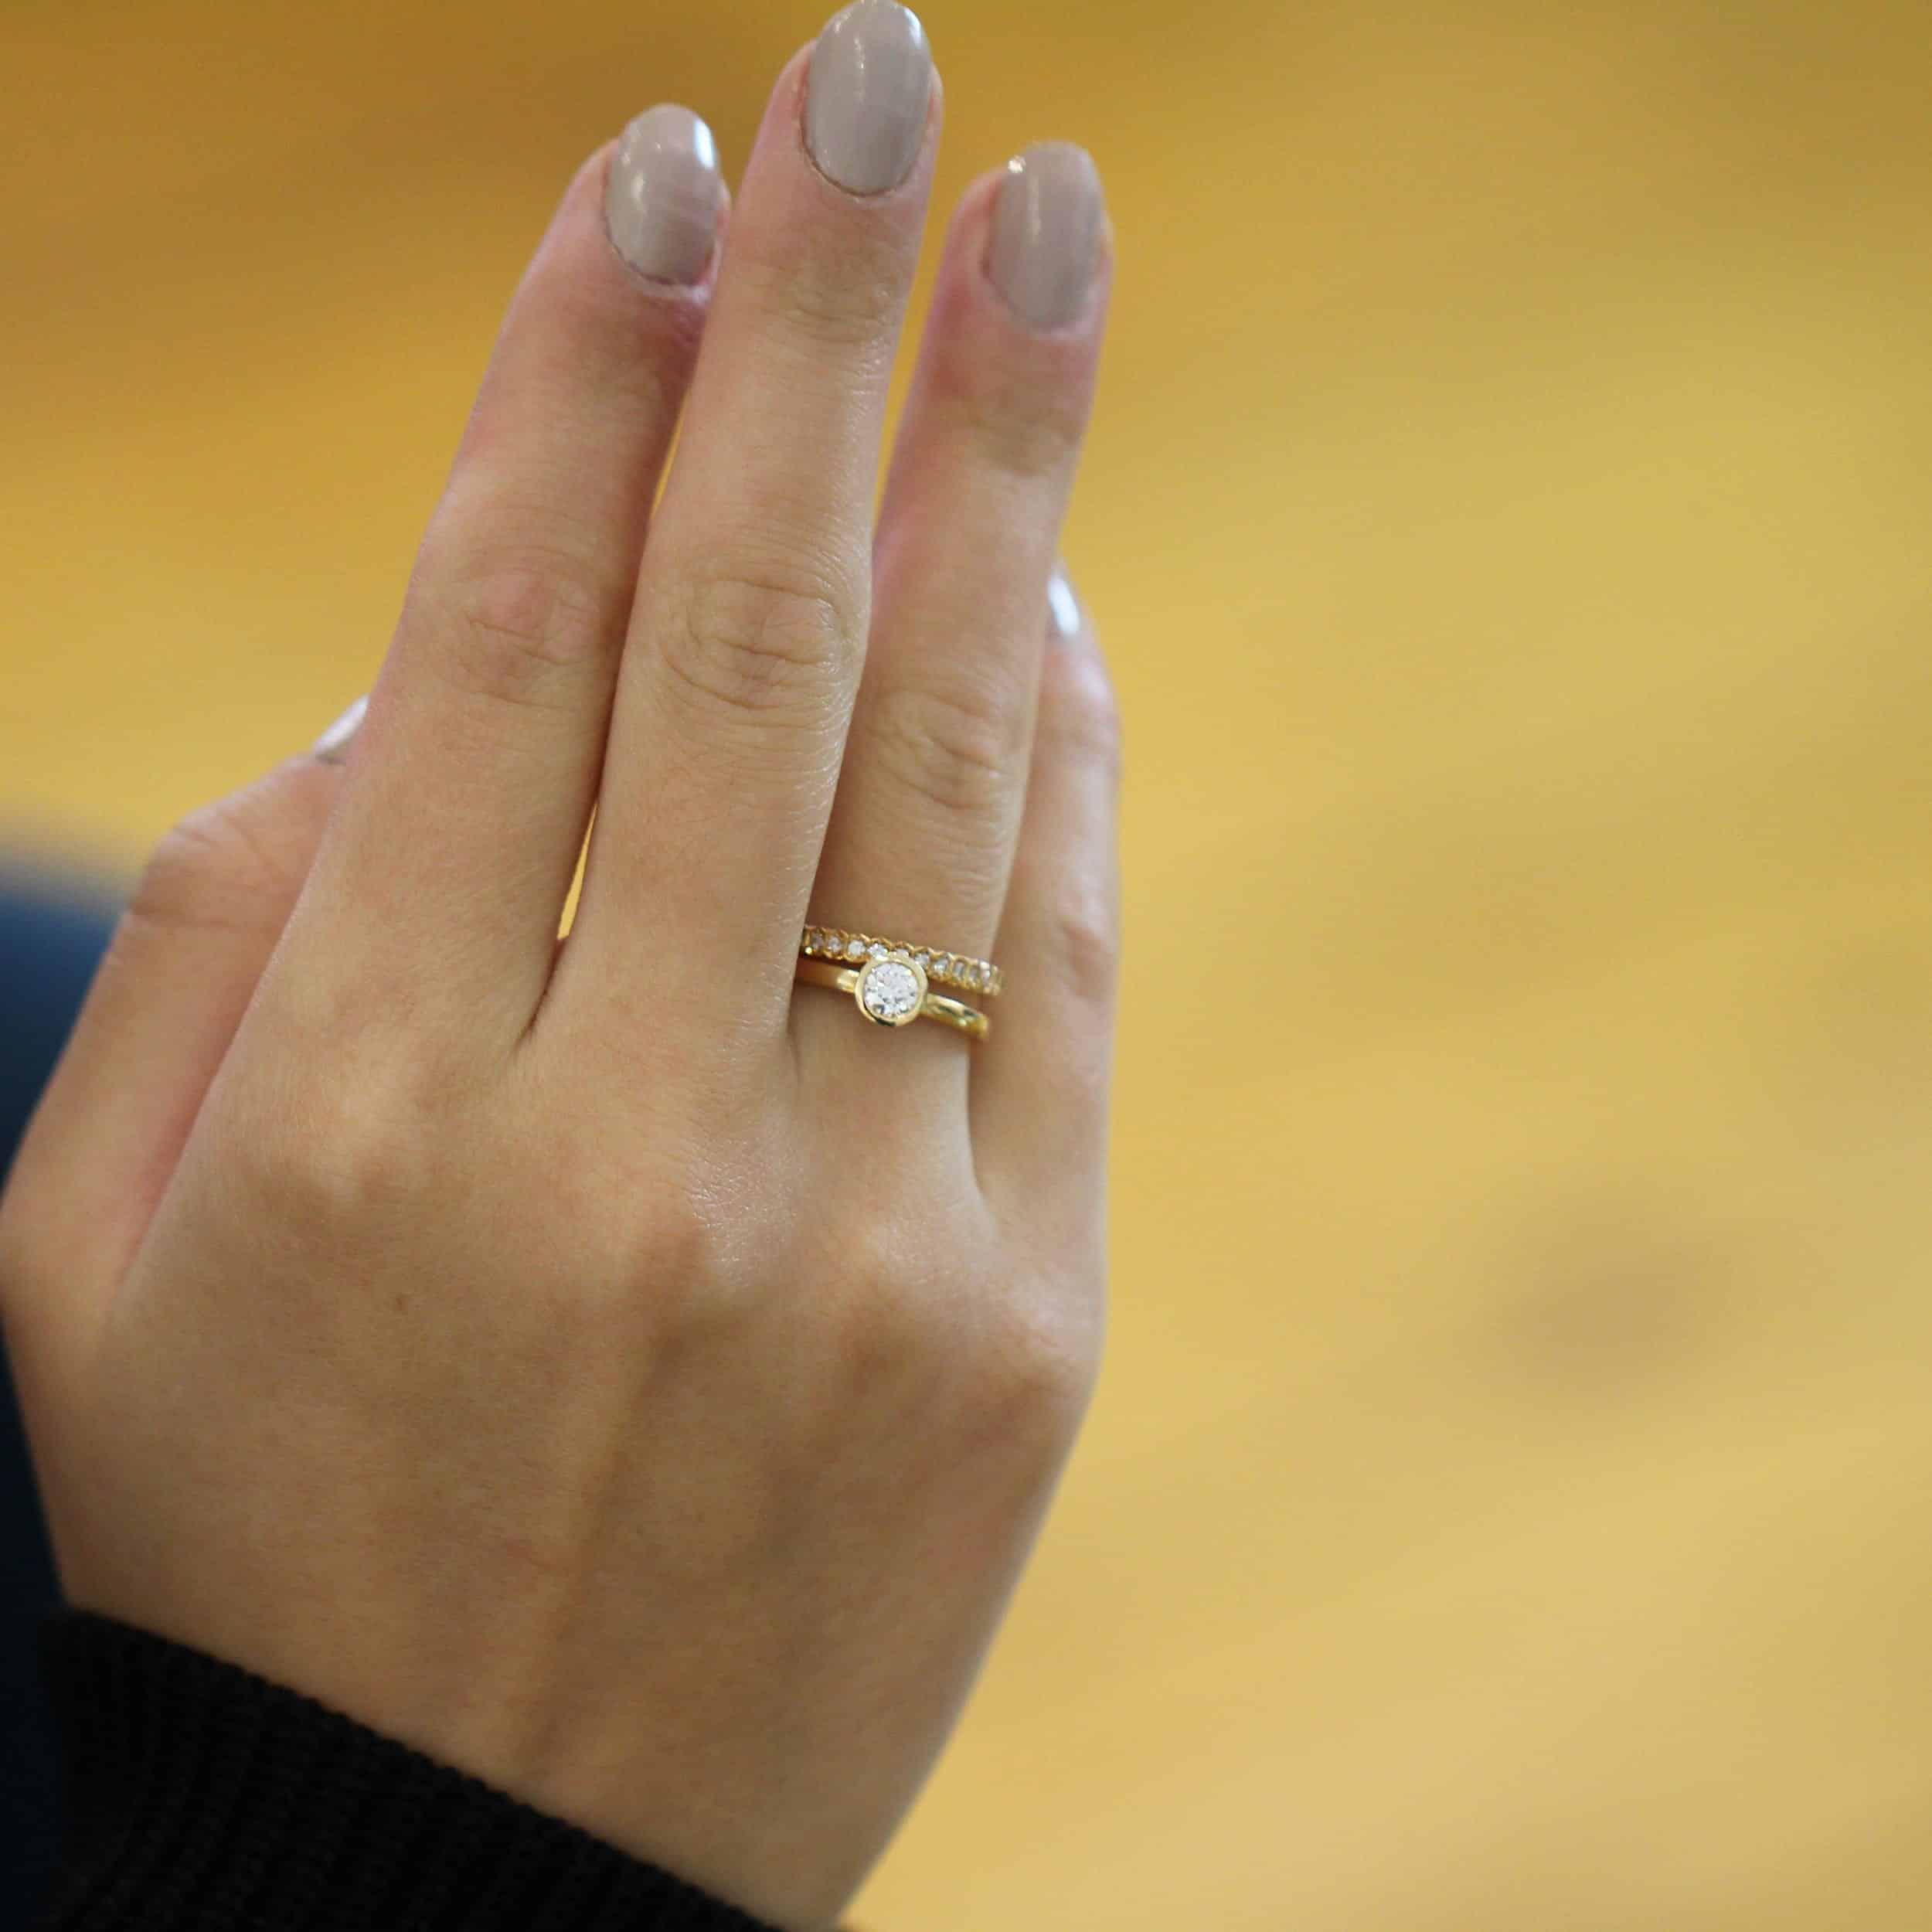 andrew geoghegan 18k rose gold diamond gabriel engagement ring designyard contemporary jewellery gallery dublin ireland